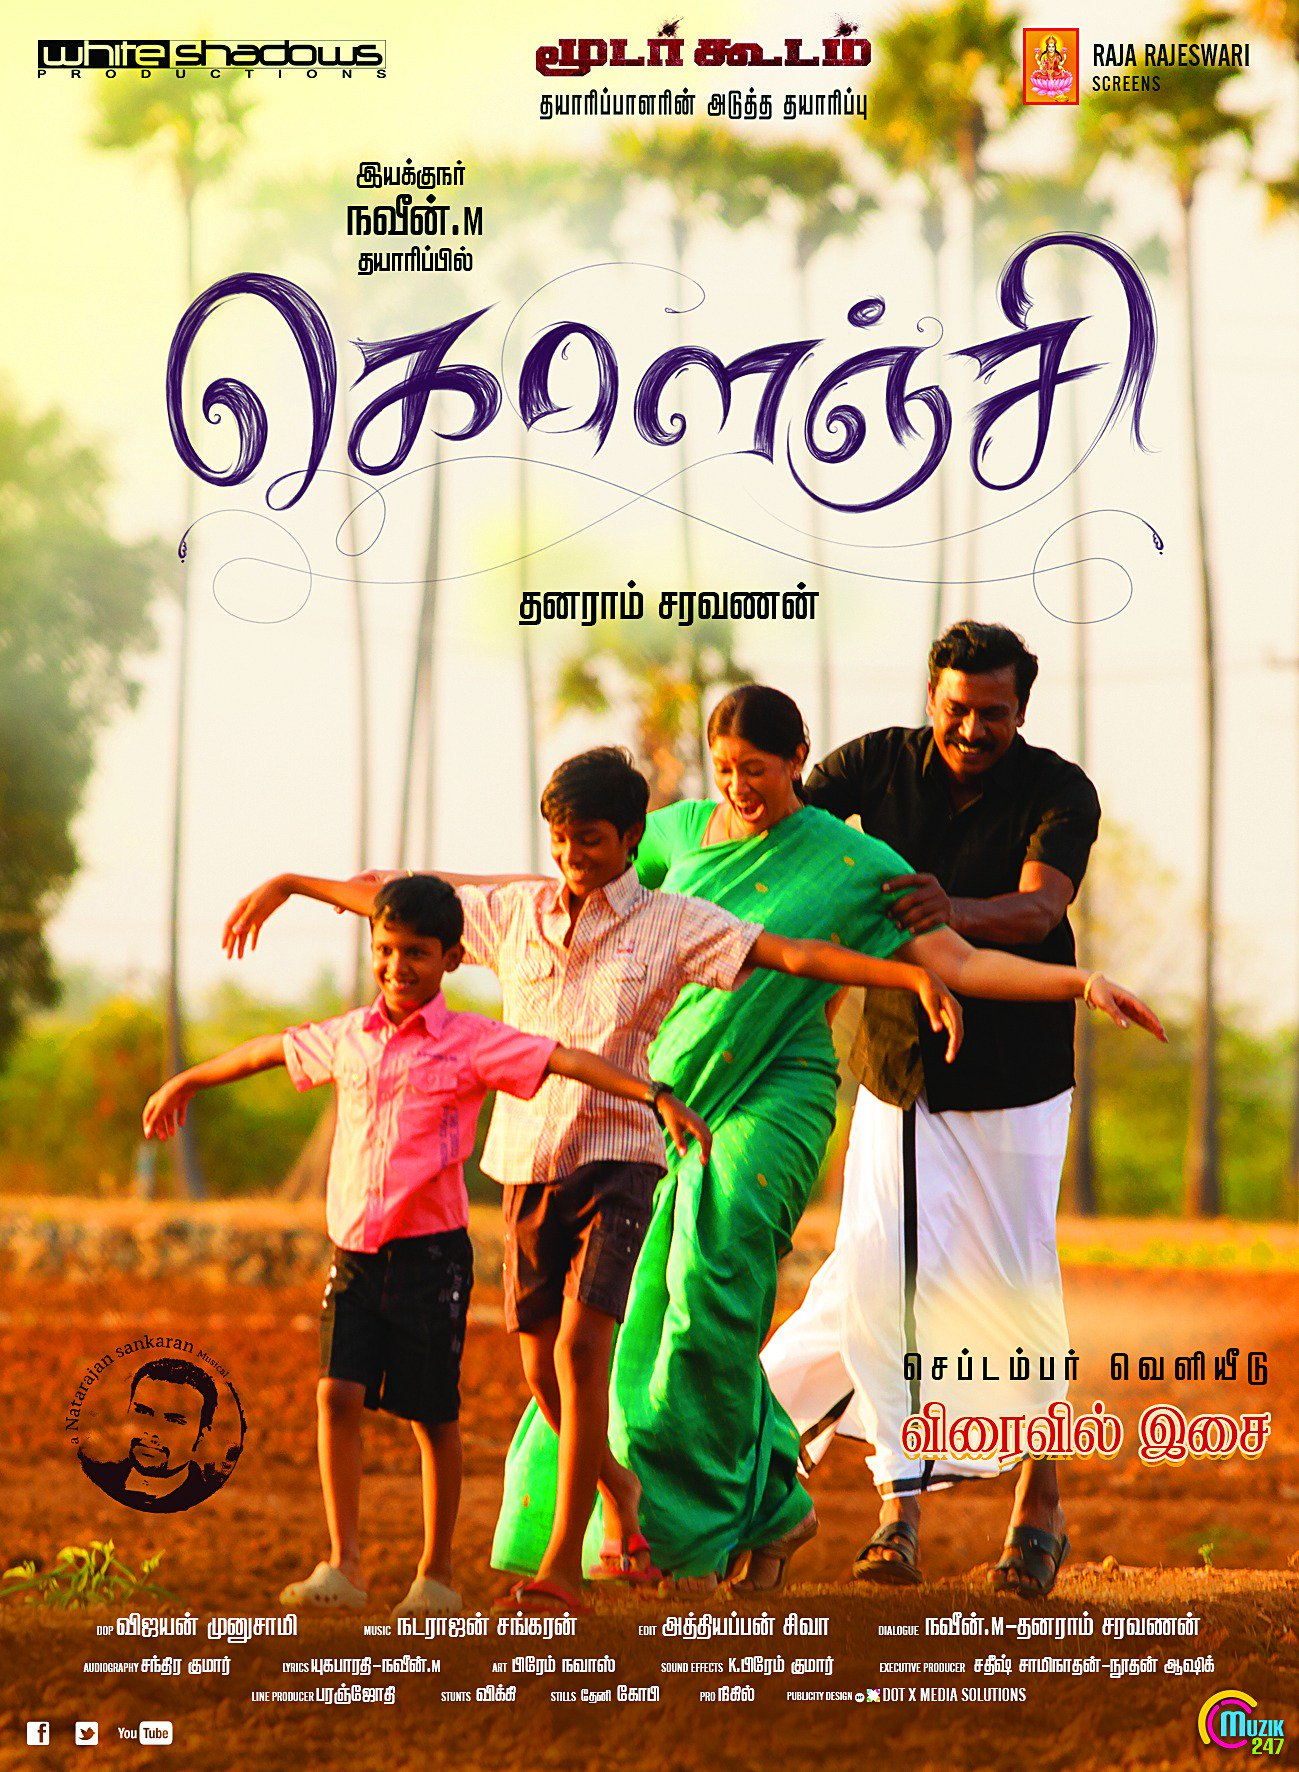 Kolanji TamilRockers Full Movie [New] Movie 2019 - High